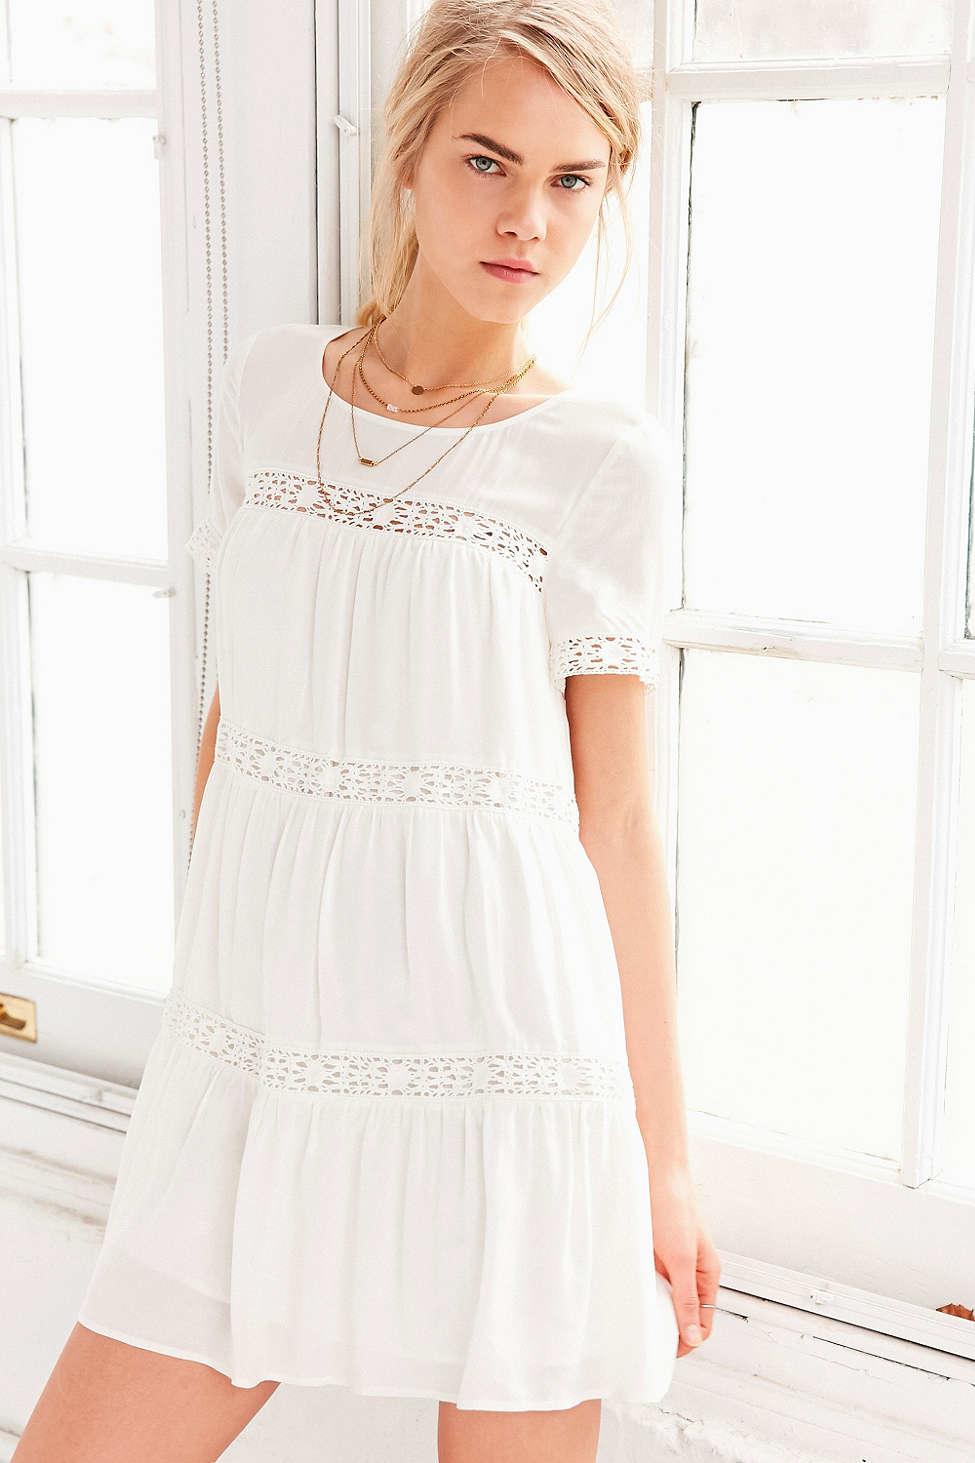 c1fd8580dc6 ALICE   UO Eleonora Crochet Inset Dress in White - Lyst